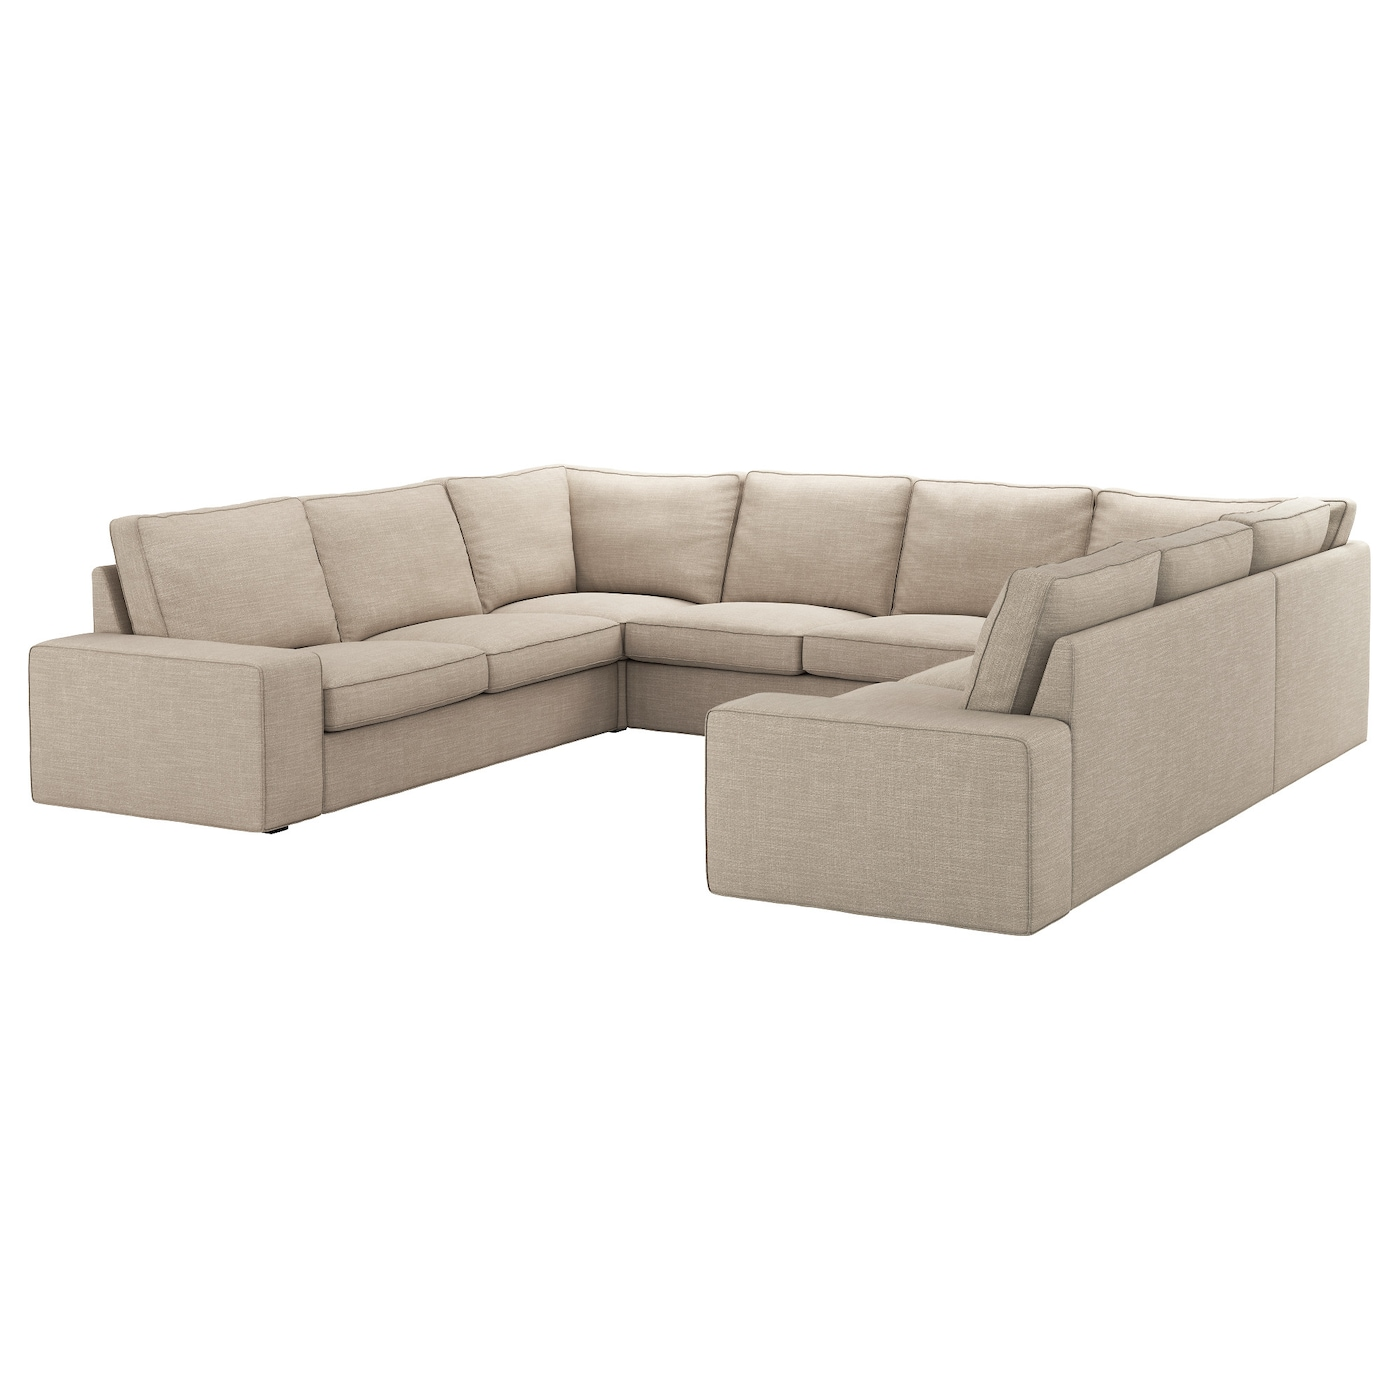 Kivik u shaped sofa 6 seat hillared beige ikea for Sofa 6 seater